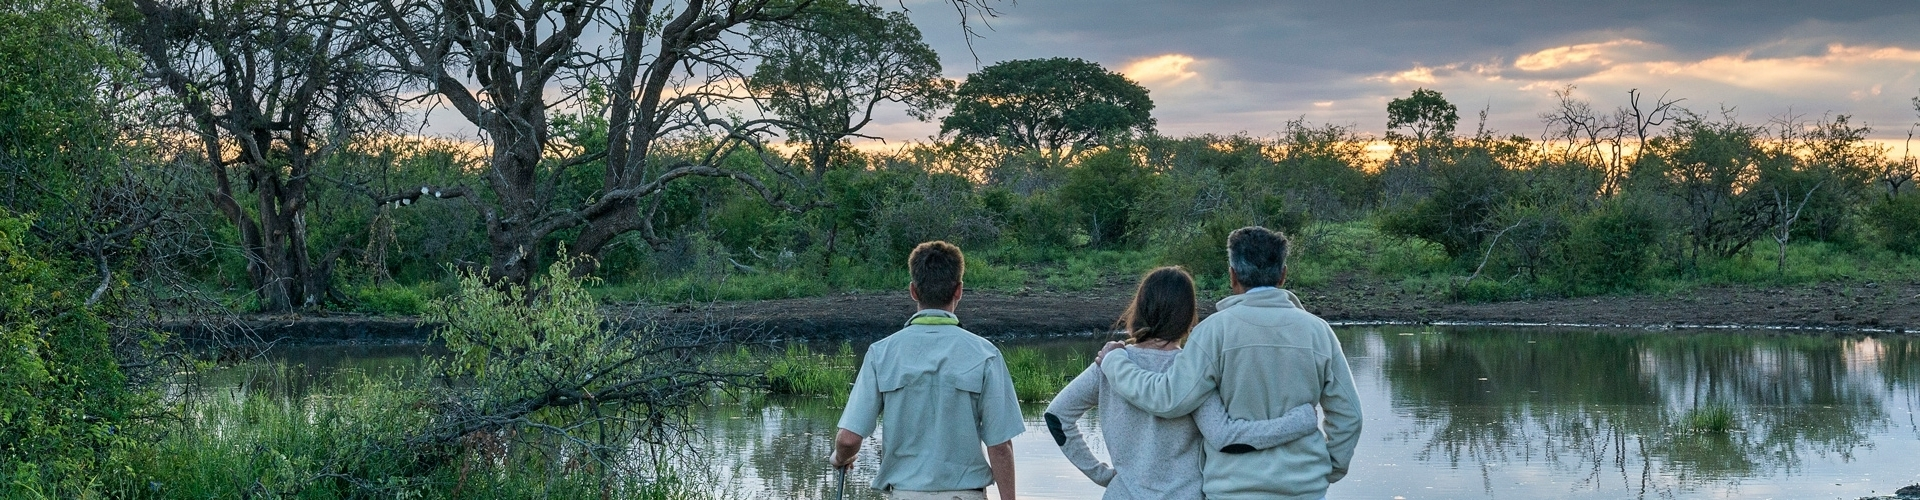 header-madikwe-private-game-reserve-safari-zuid-afrika-1920x500-1